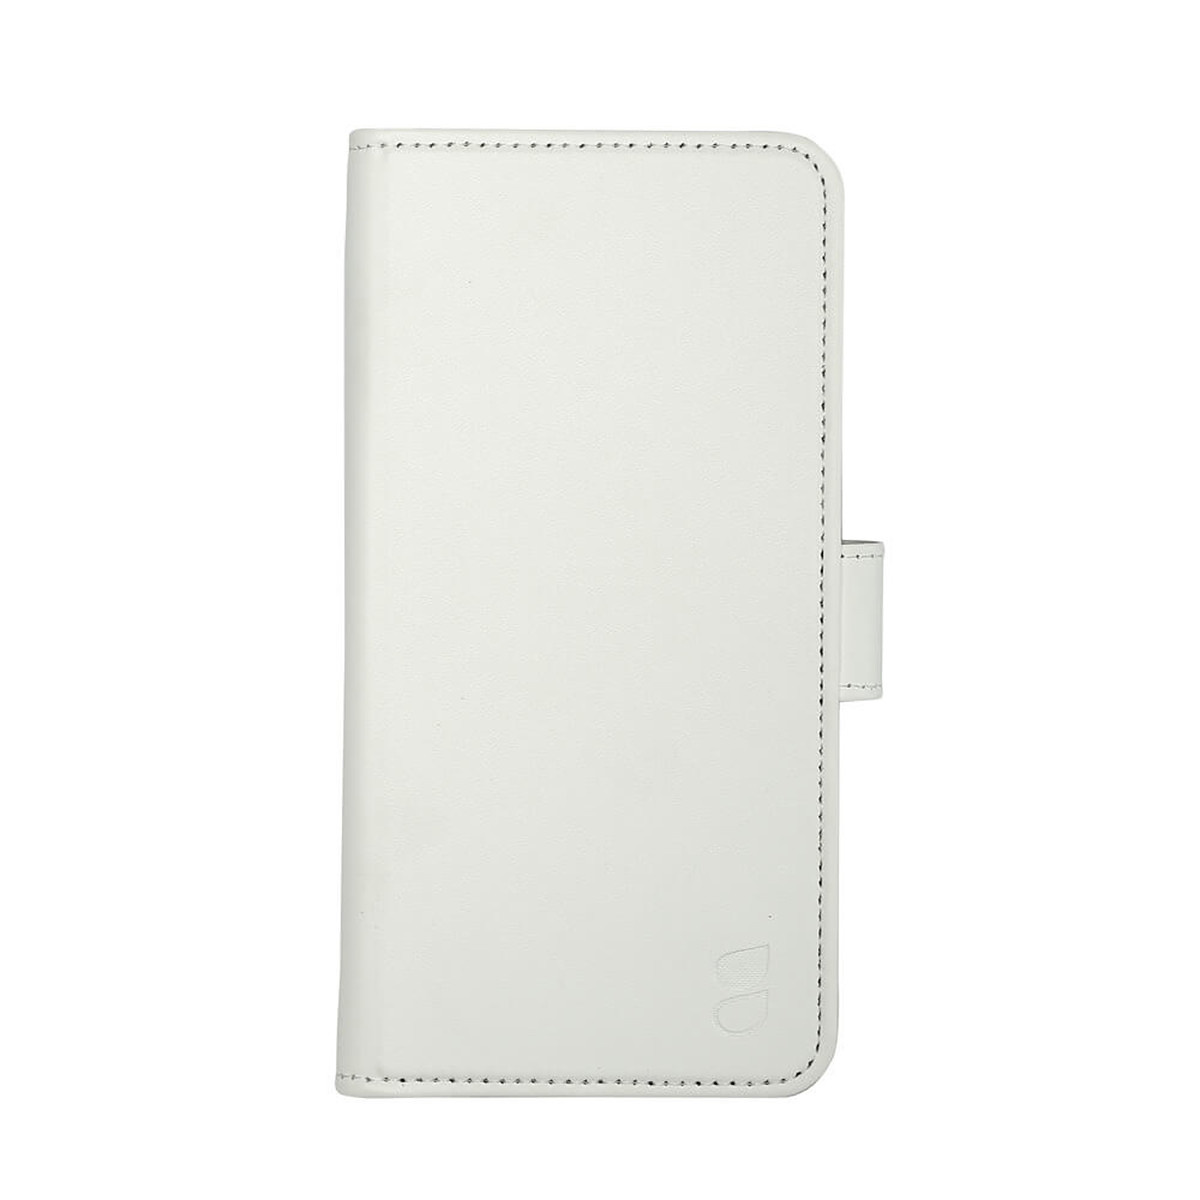 Gear plånboksväska, iPhone 11 Pro Max, vit